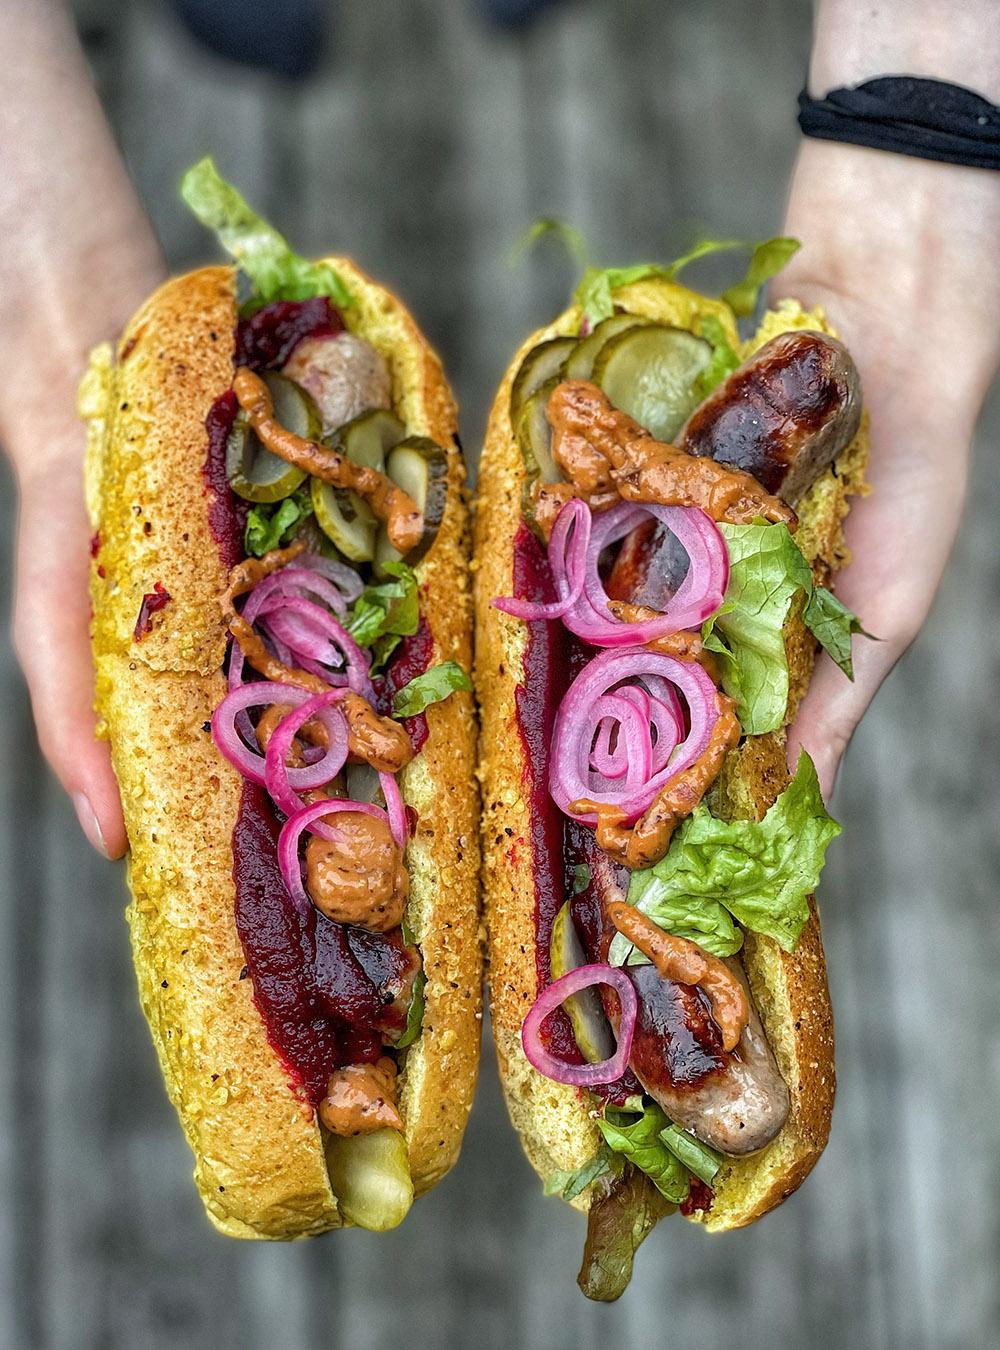 Hot Dog vom Grill mit Rote Bete Ketc